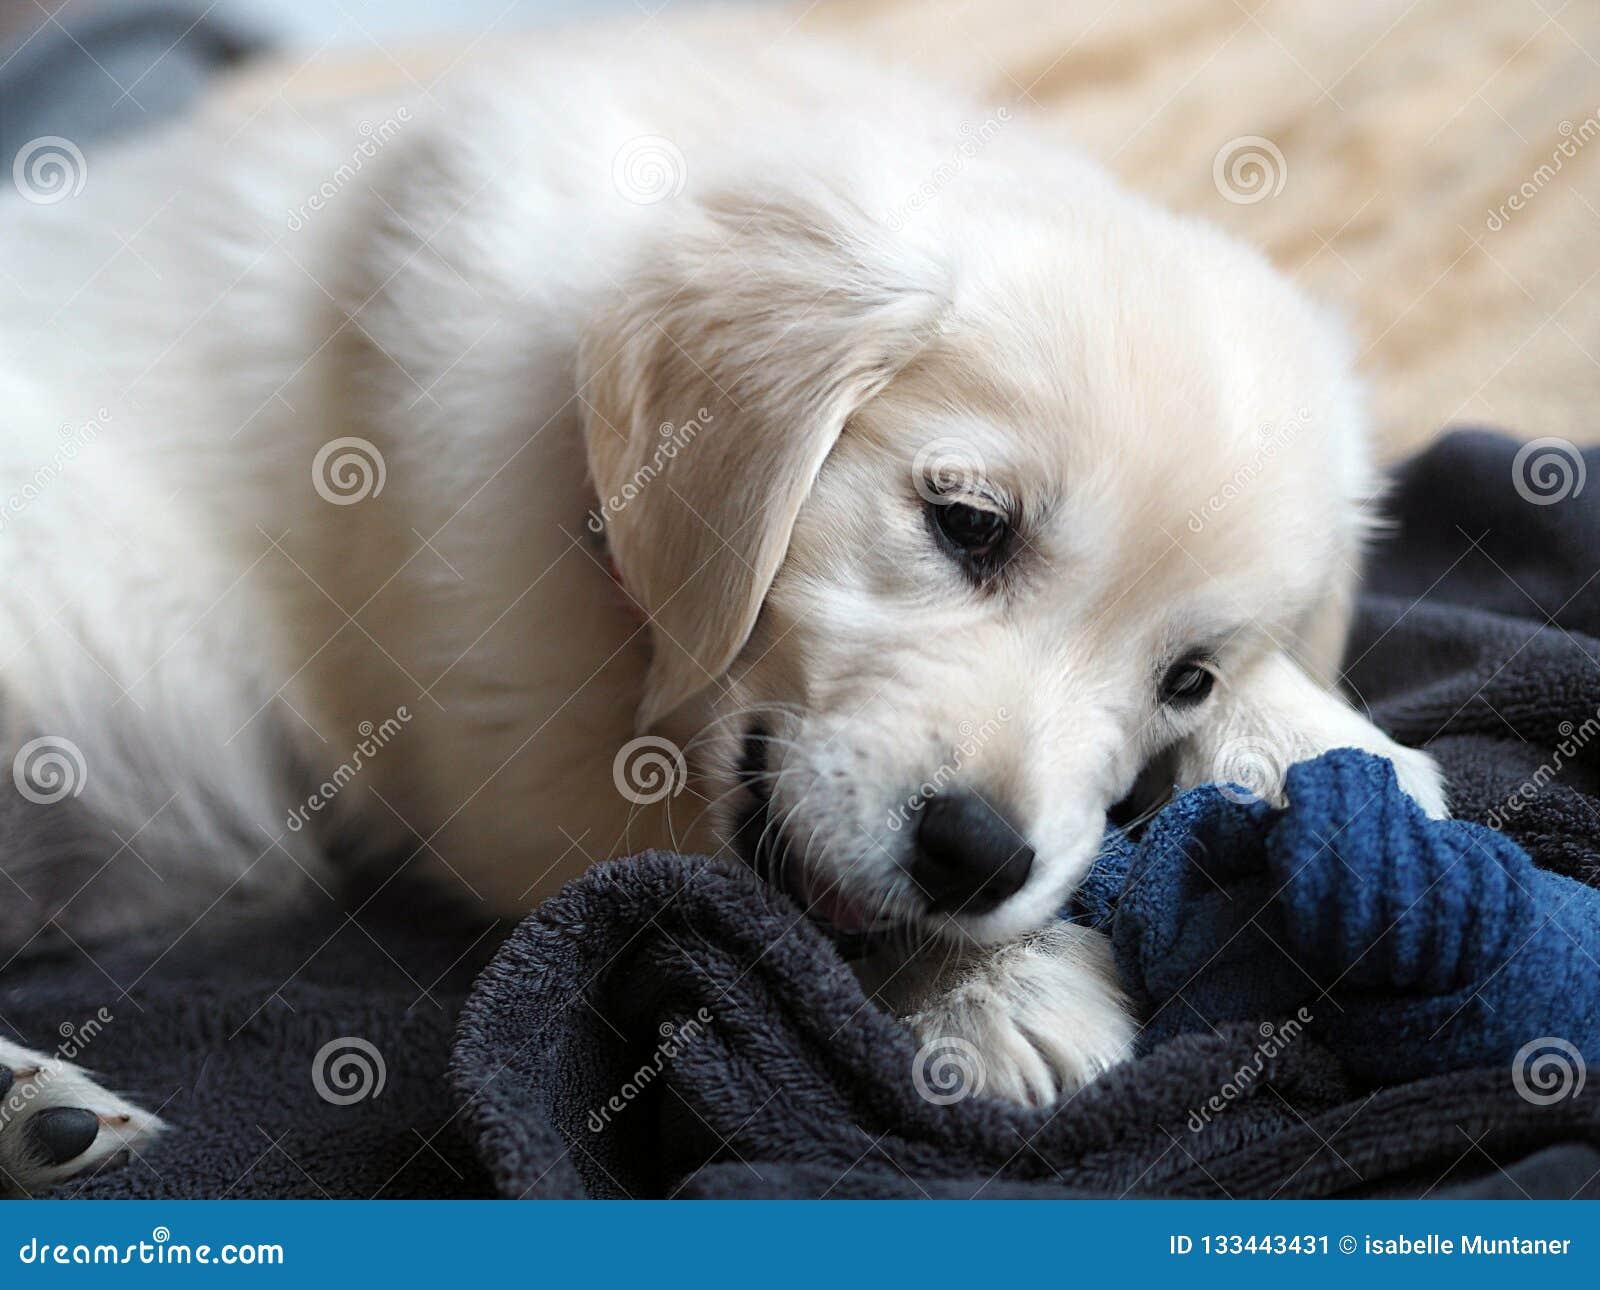 Young Golden Retriever Puppy In Full Destruction Of Sock